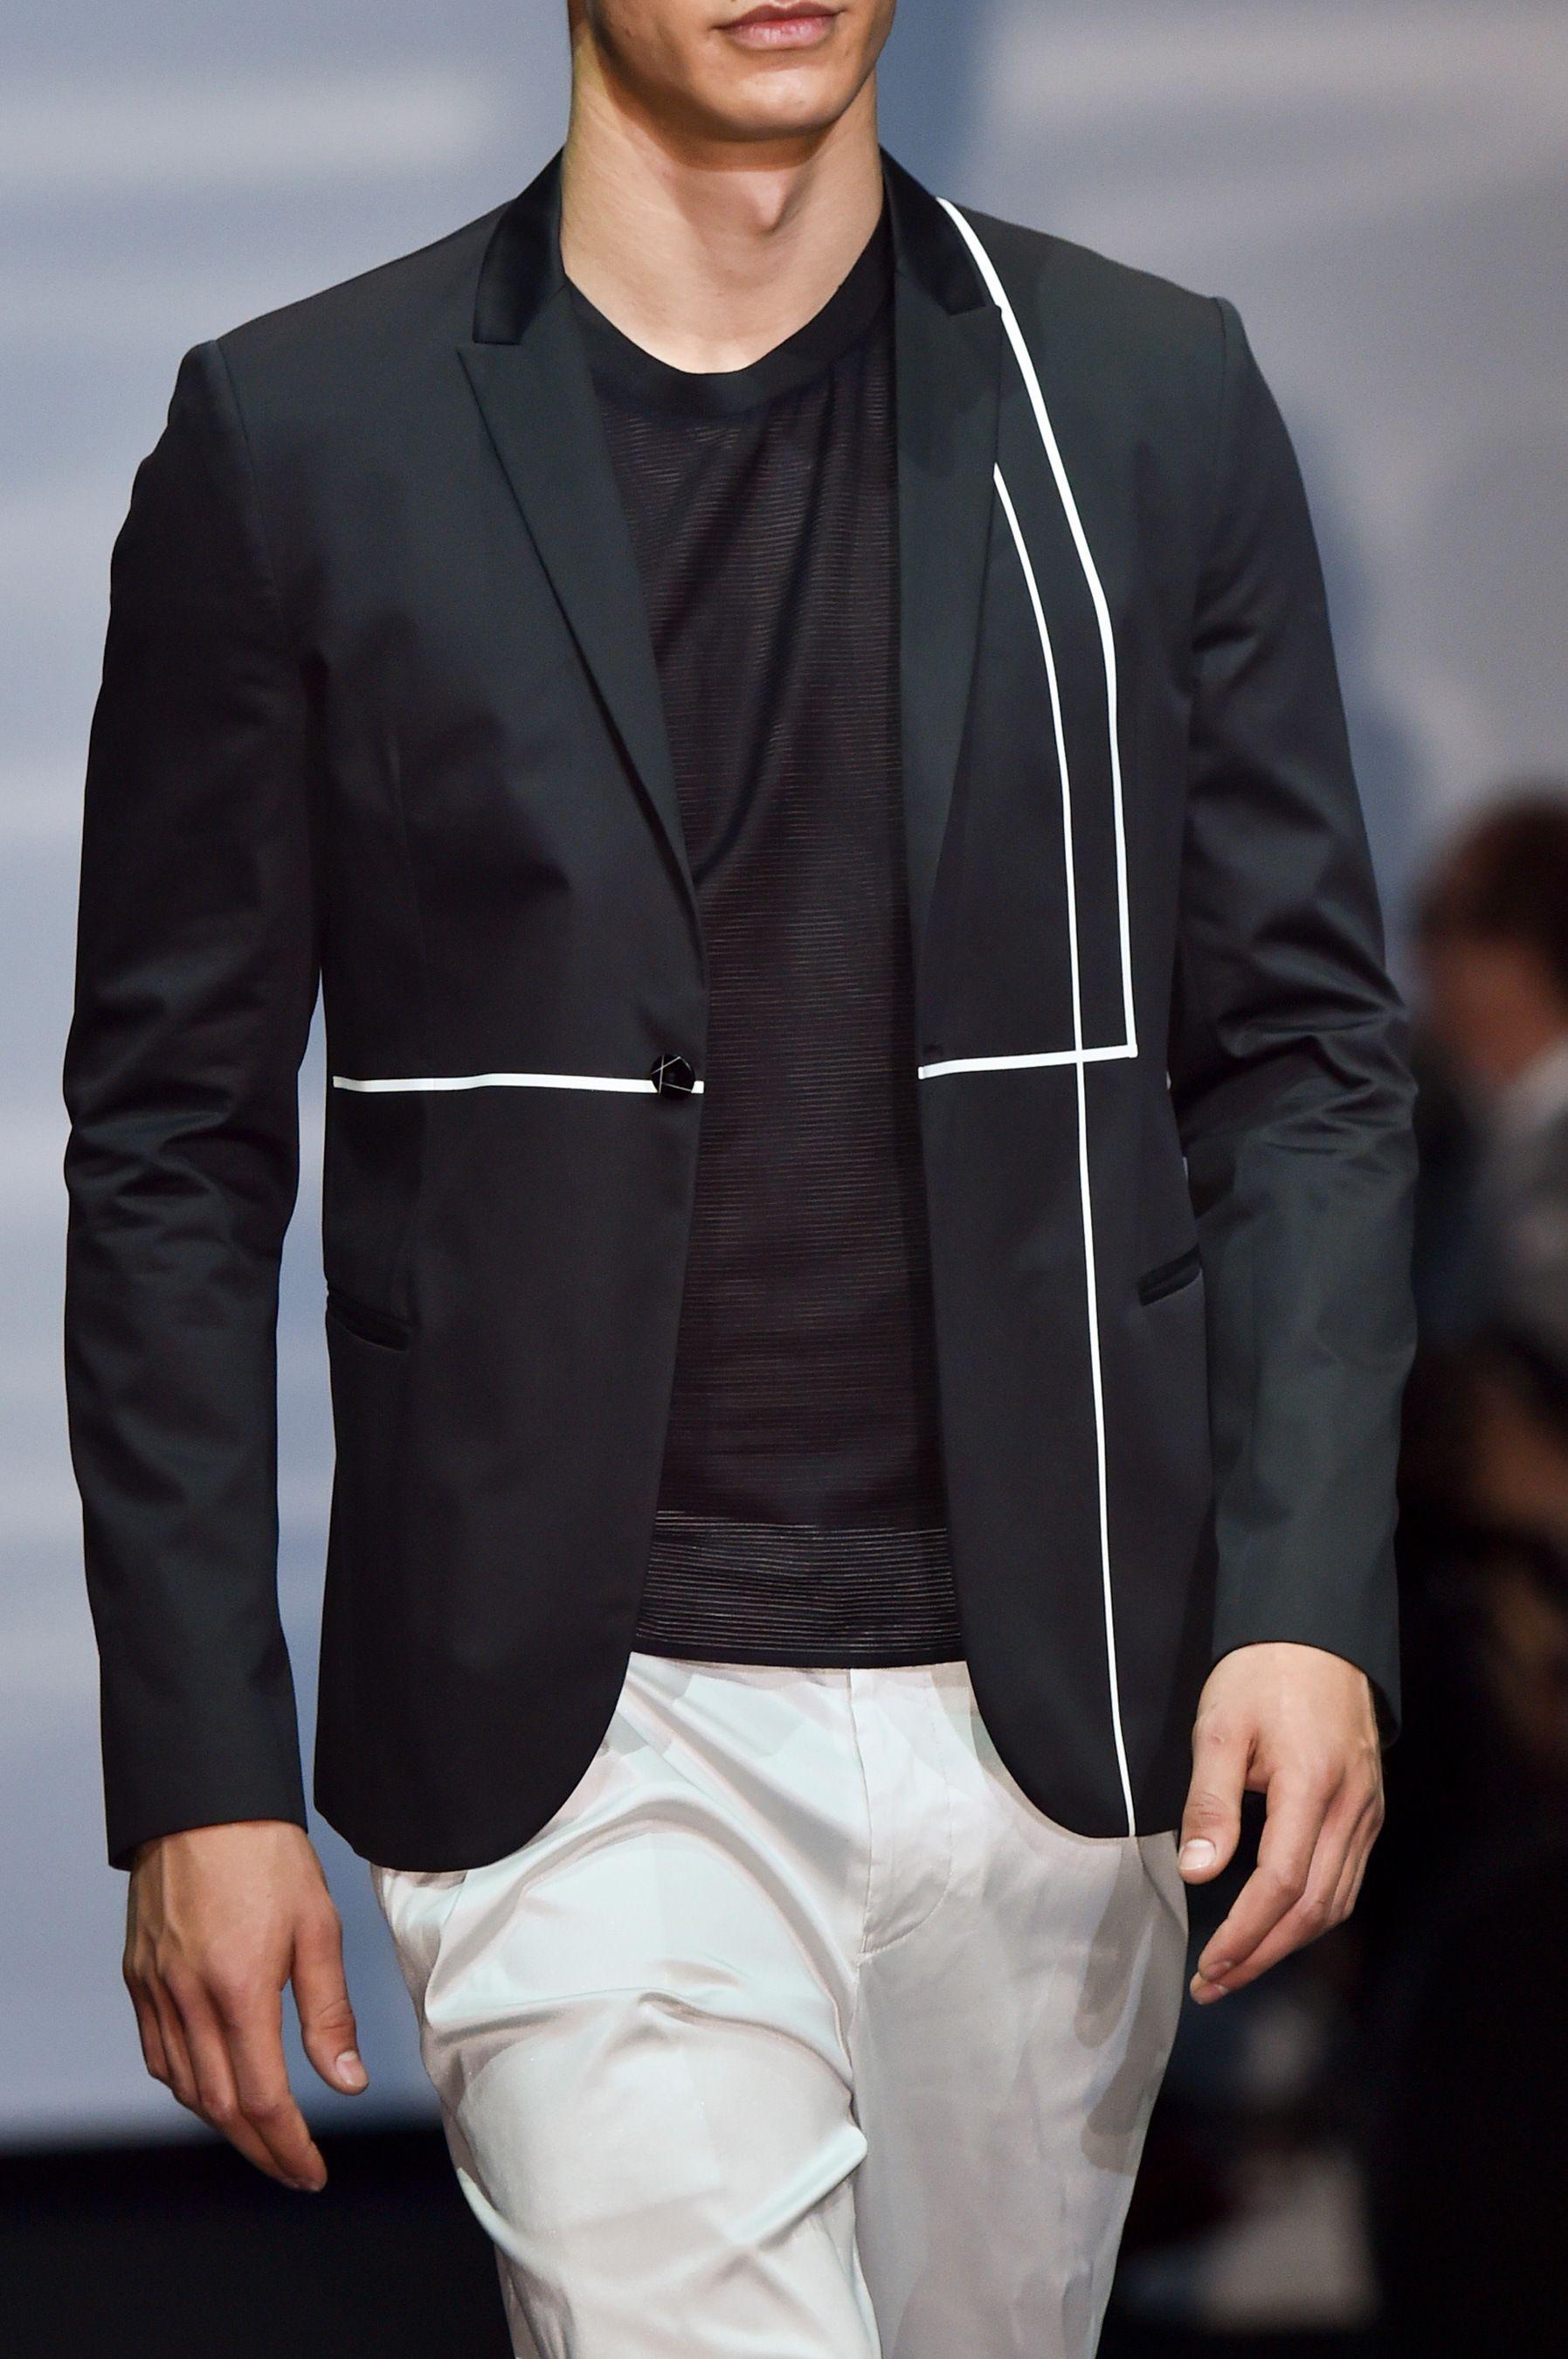 Farb-und Stilberatung mit www.farben-reich.com - Emporio Armani Spring 2015 Menswear.